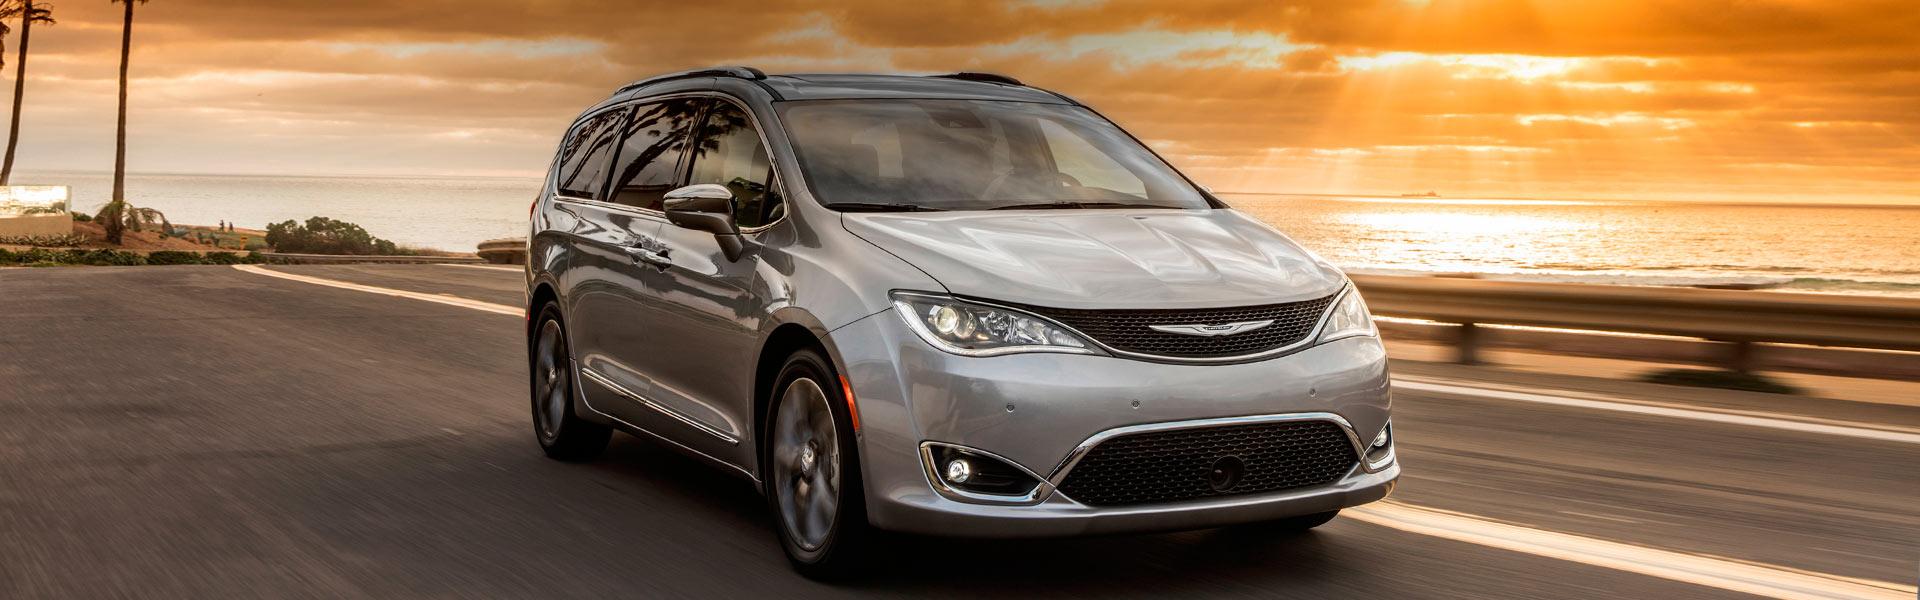 Запчасти на Chrysler Pacifica